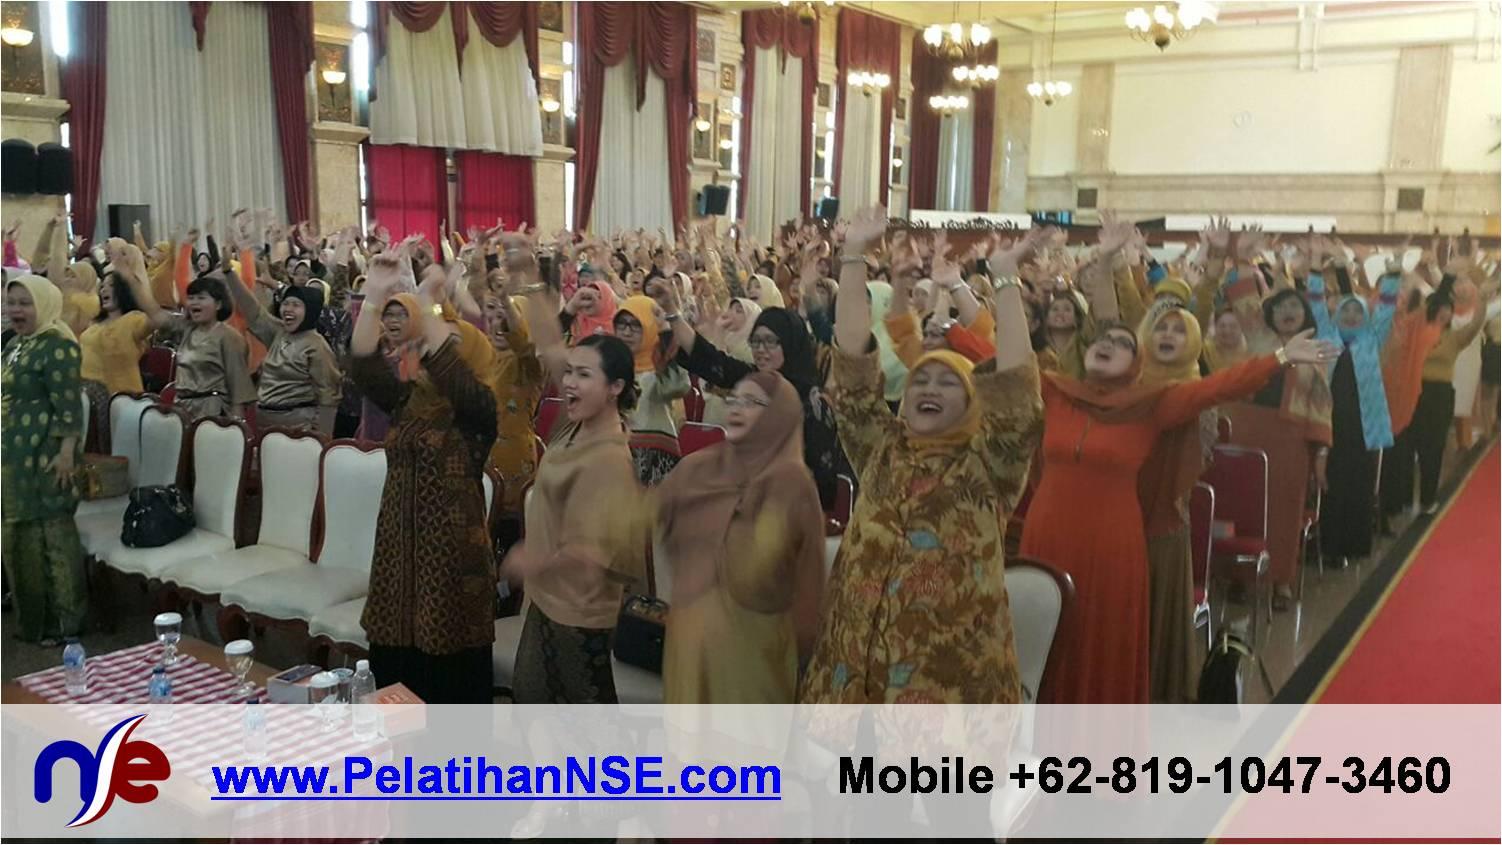 Yoga Tawa - Nova Inspiring Day 29 April 2015 - 1000 peserta berteriak Aku Bebas.png